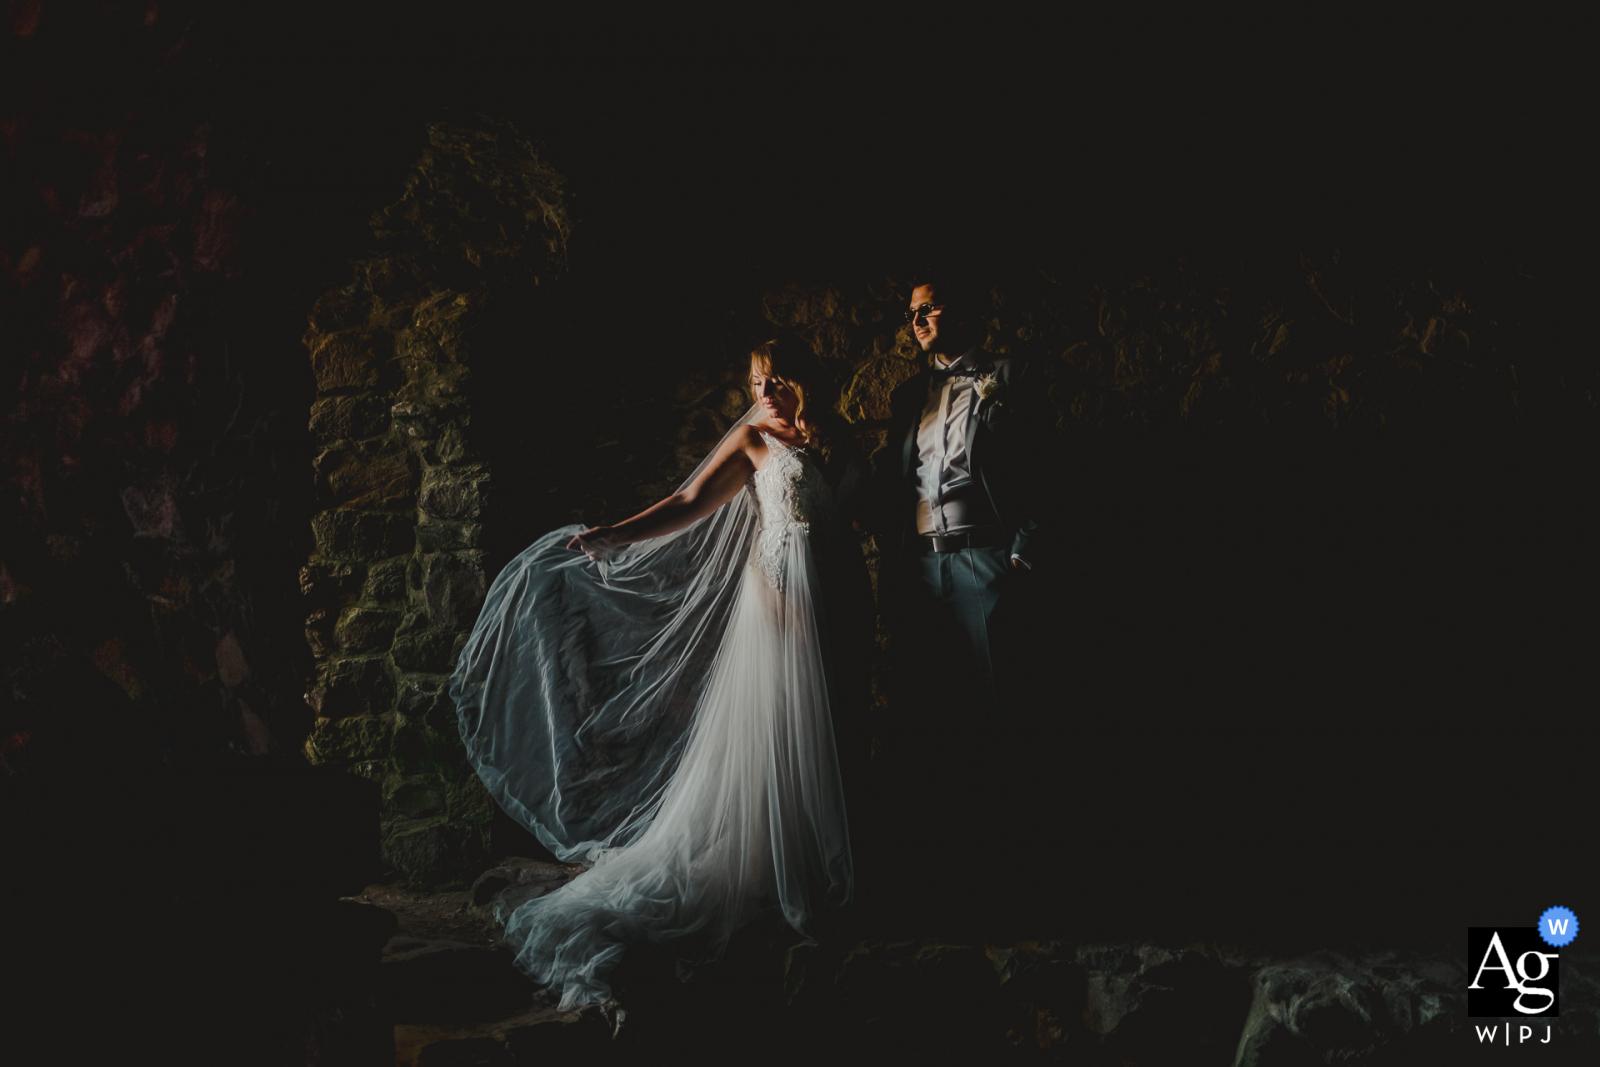 Gleisberg artistic wedding photo of the Bride and groom in great lighting